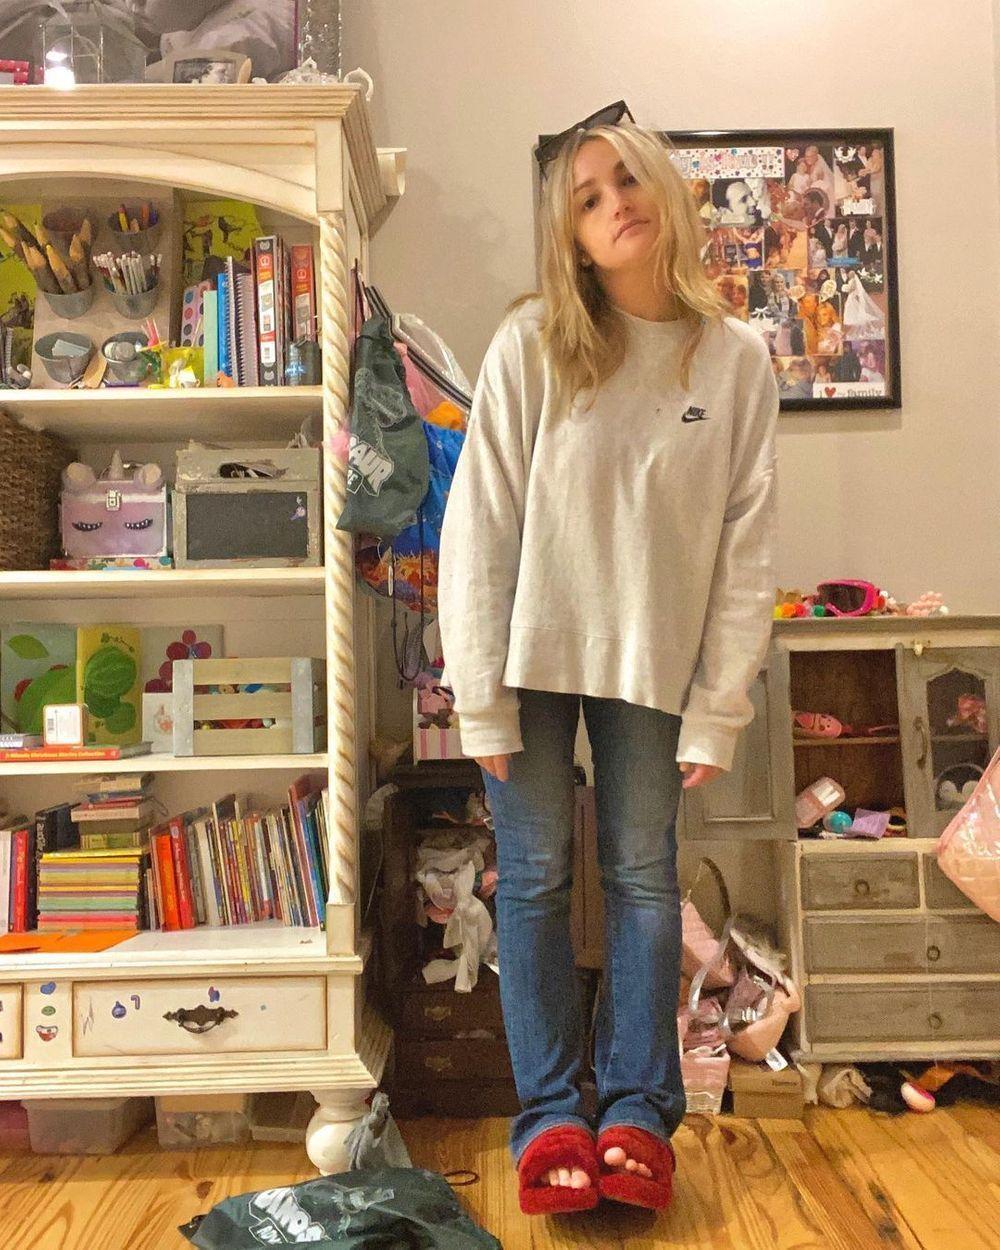 Jamie Lynn Spears home in jeans